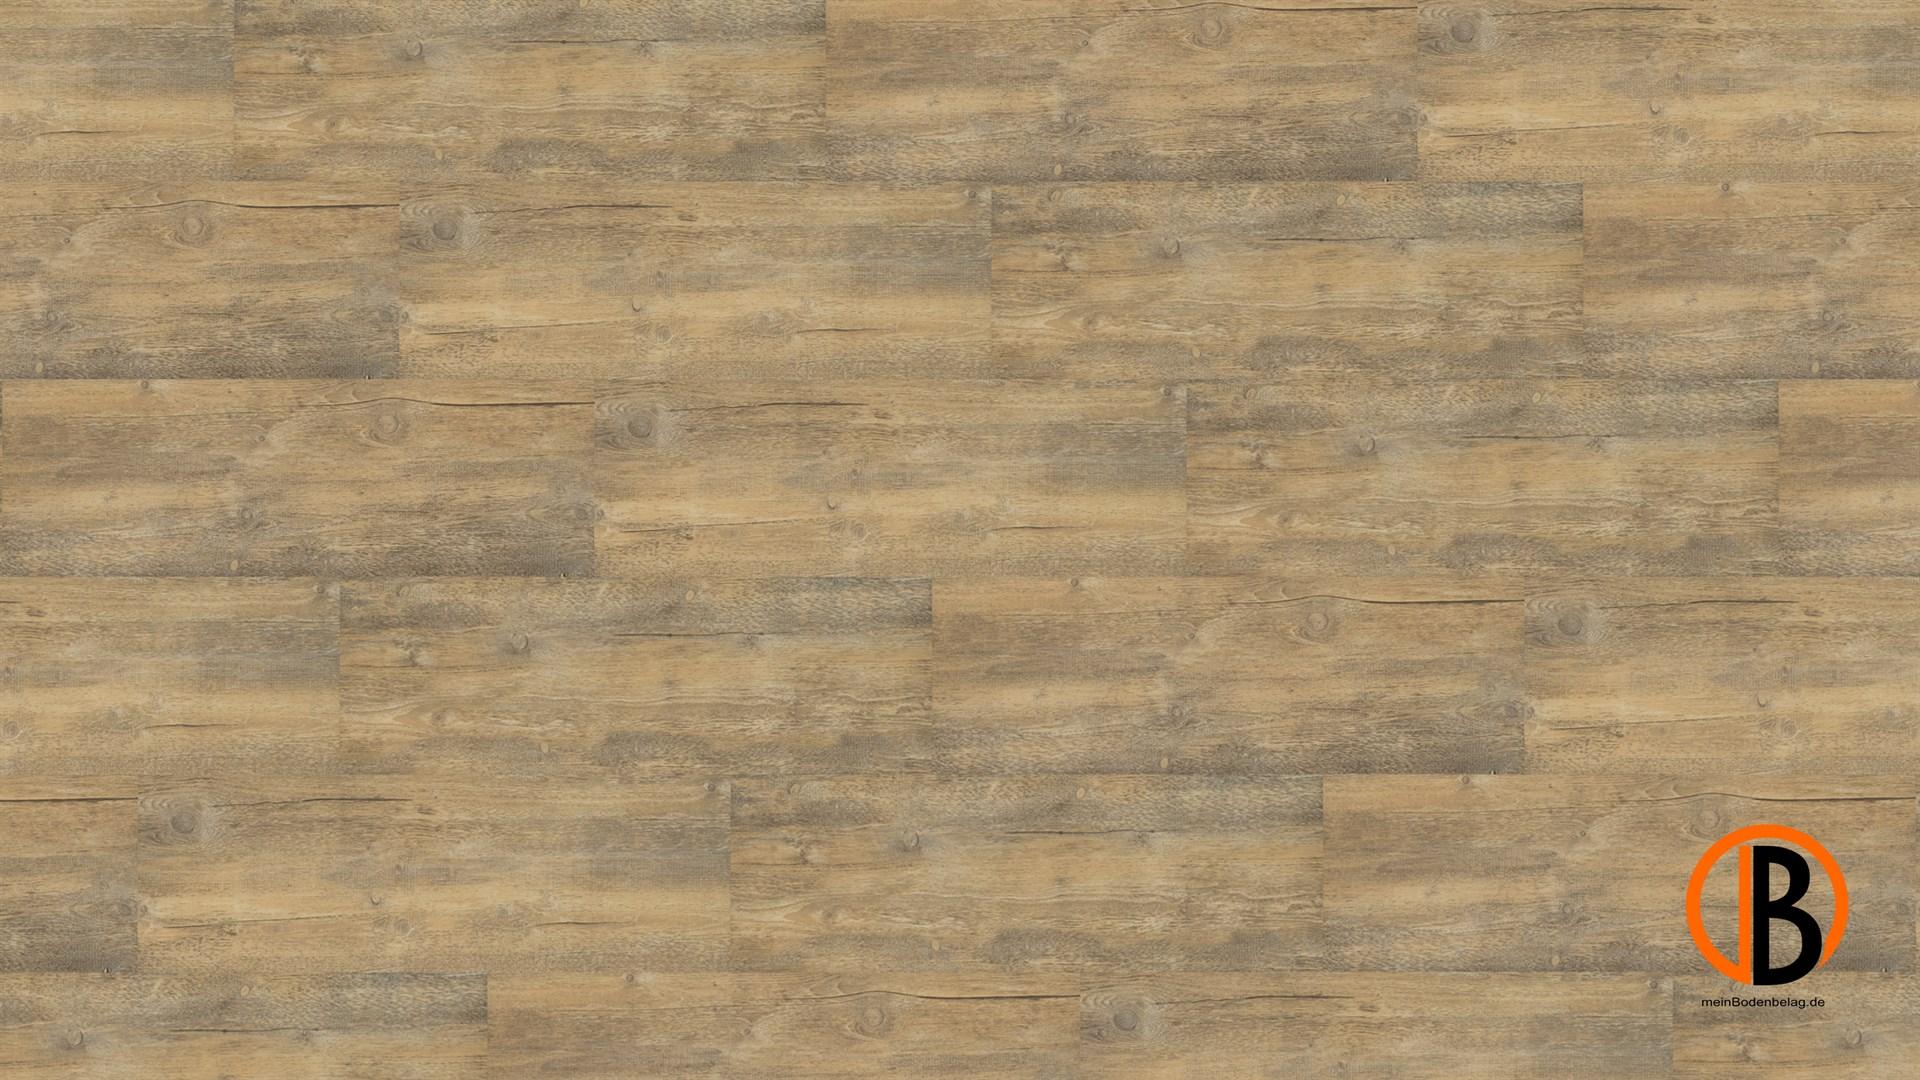 CINQUE KWG DESIGNERVINYL ANTIGUA CLASSIC SYNCHRONY SHEETS | 10000142;0 | Bild 1